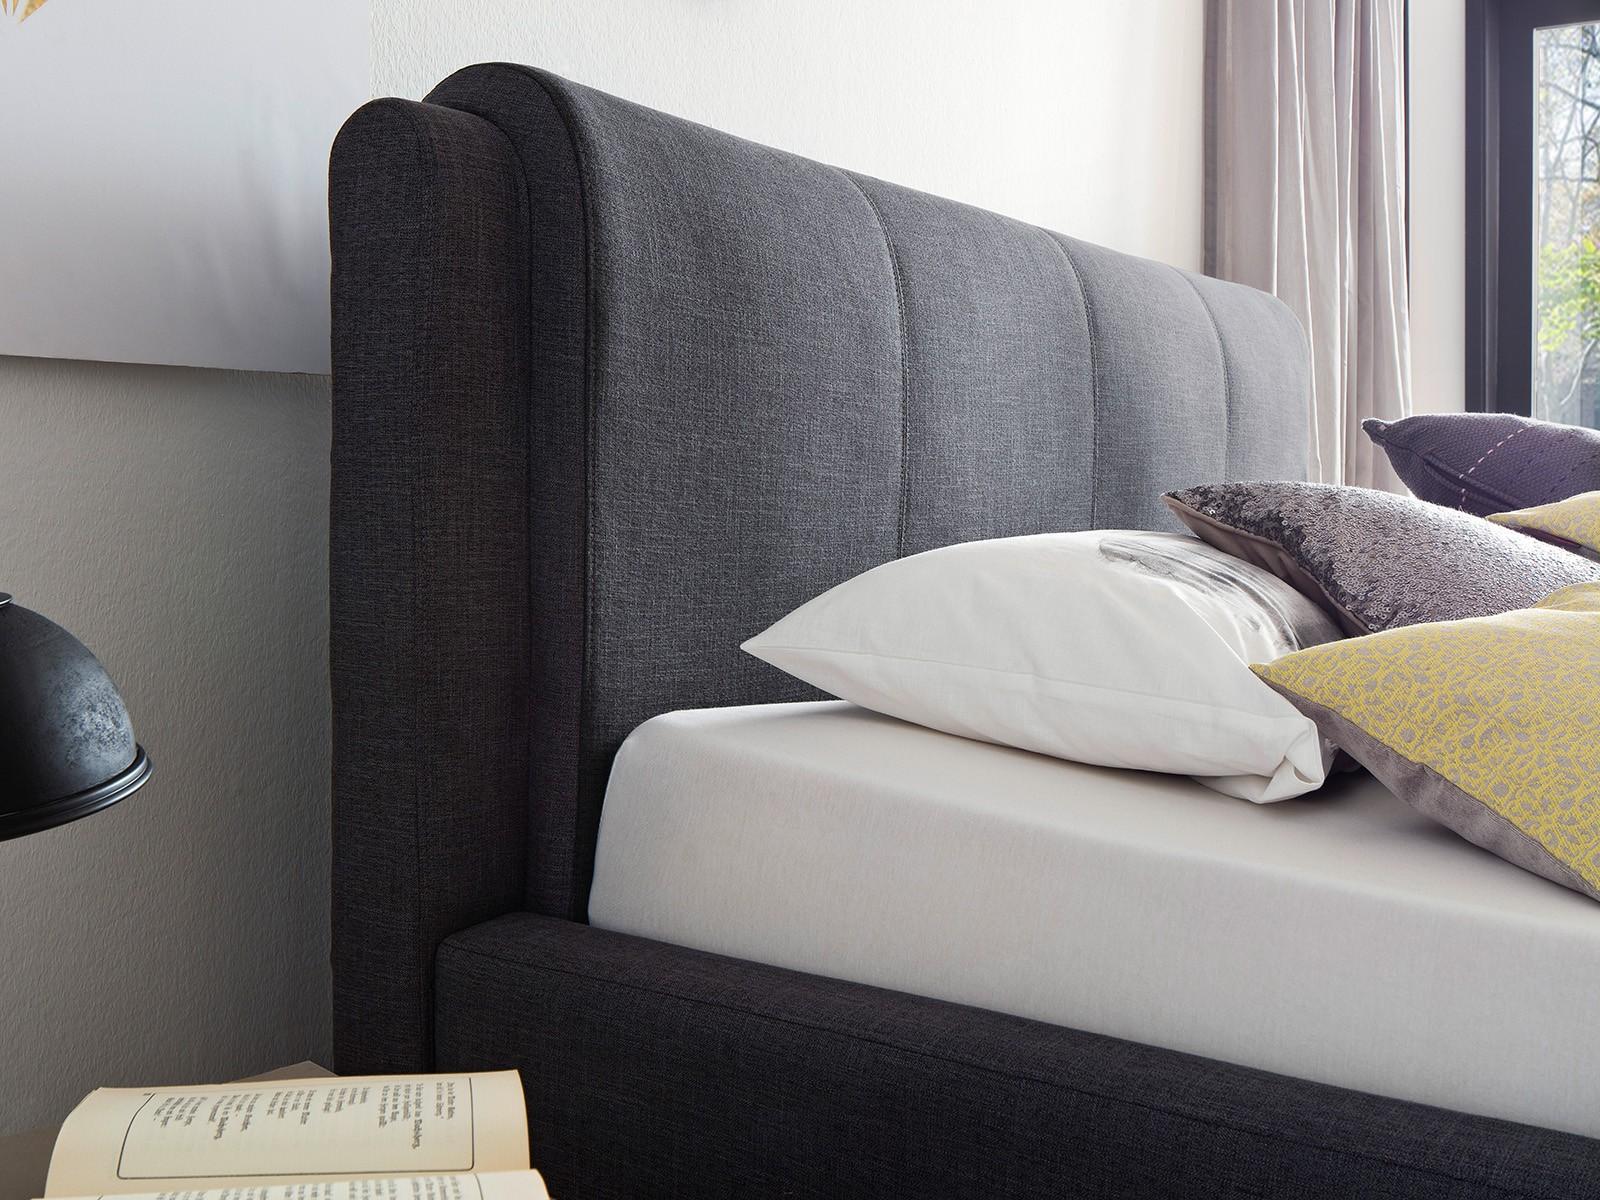 polsterbett el paso mit stoffbezug culture anthrazit 140x200 cm inkl bettkasten und lattenrost. Black Bedroom Furniture Sets. Home Design Ideas